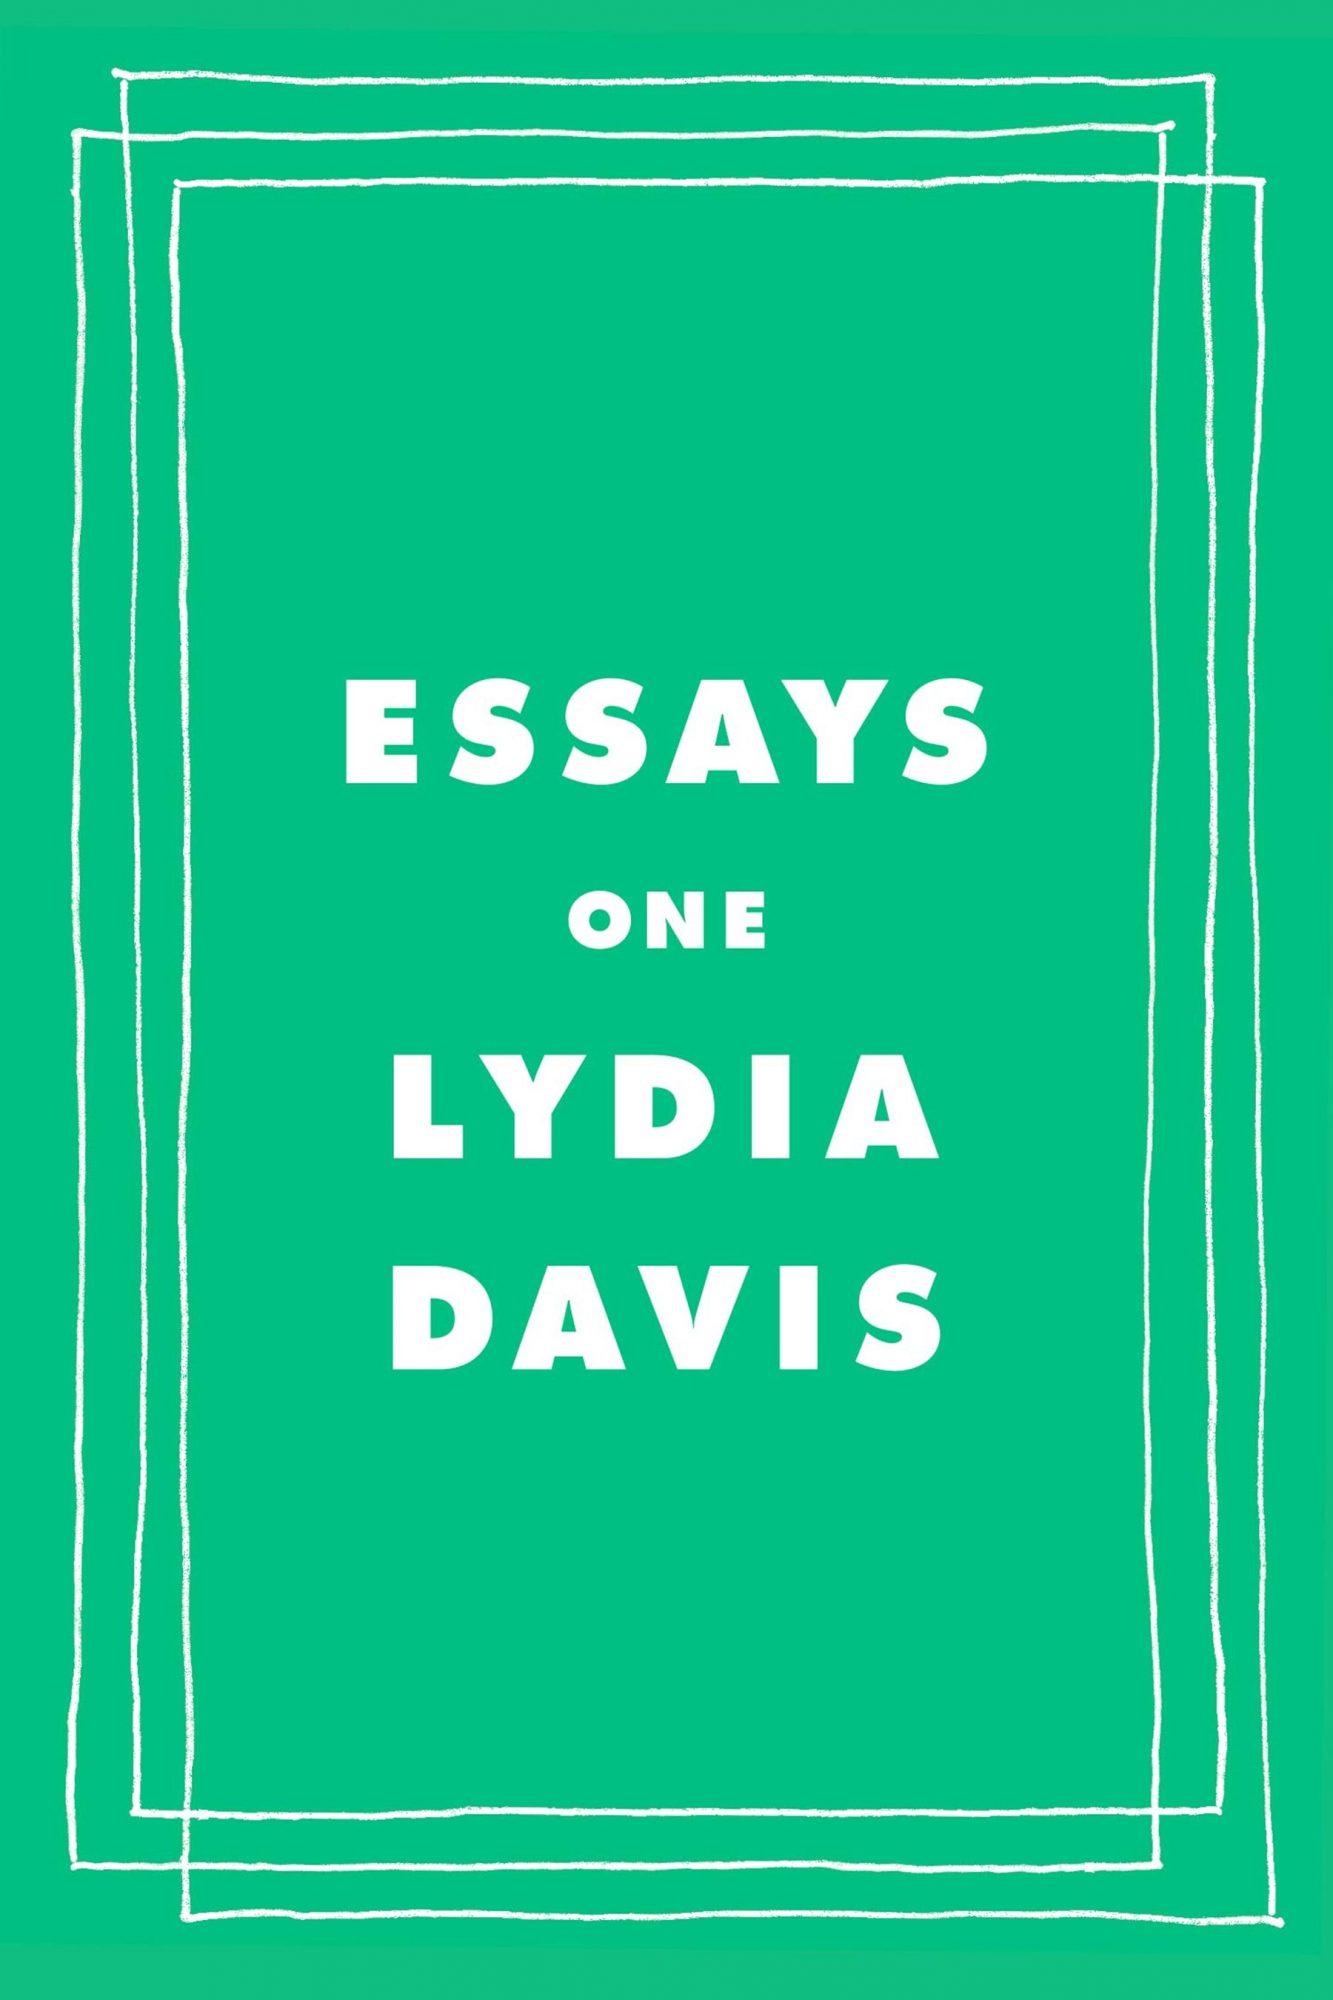 Lydia Davis, Essays OnePublisher: Farrar, Straus and Giroux